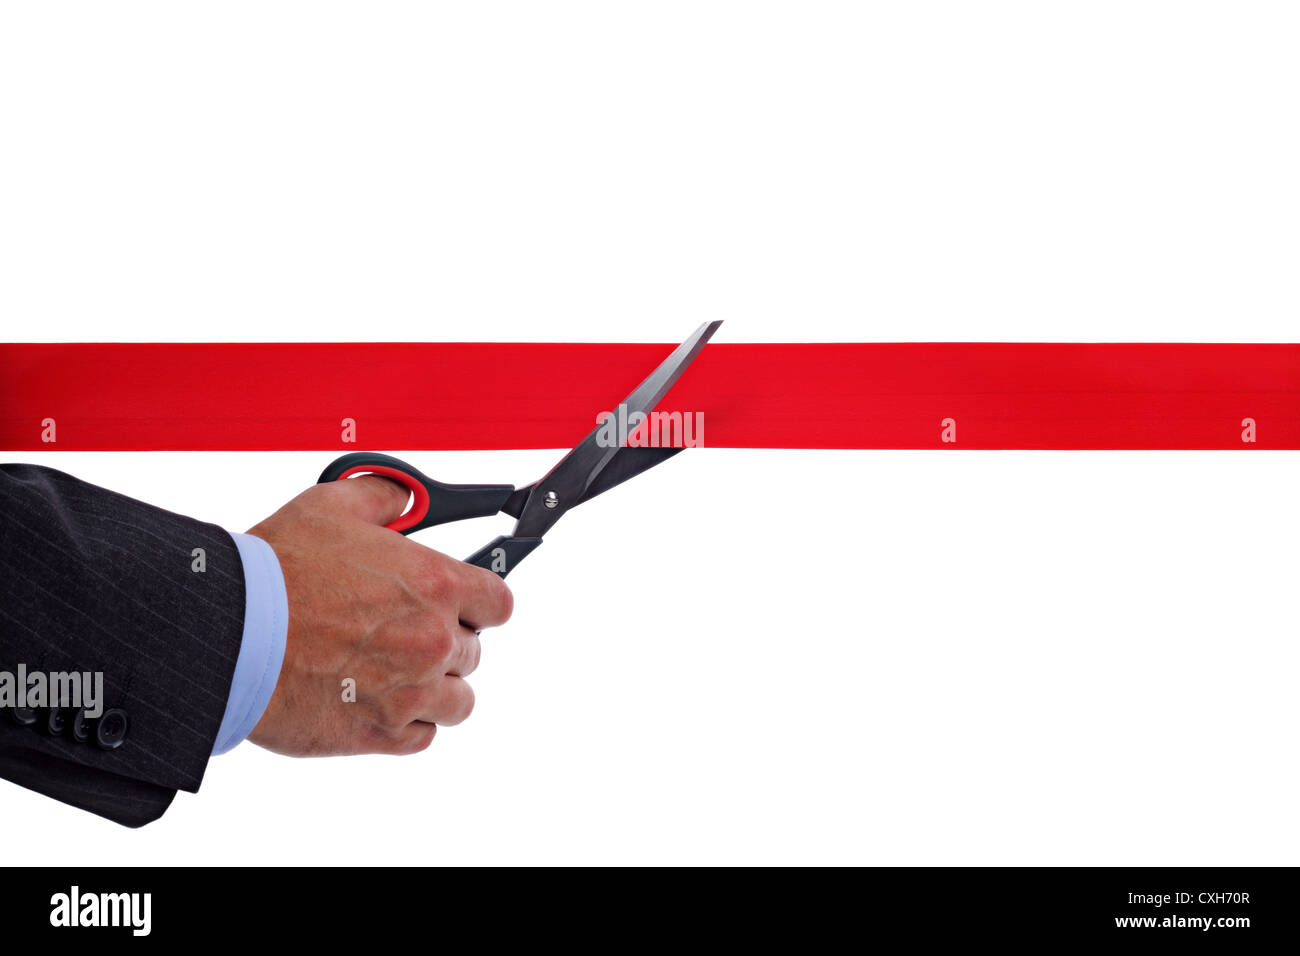 Corte de cinta roja Imagen De Stock